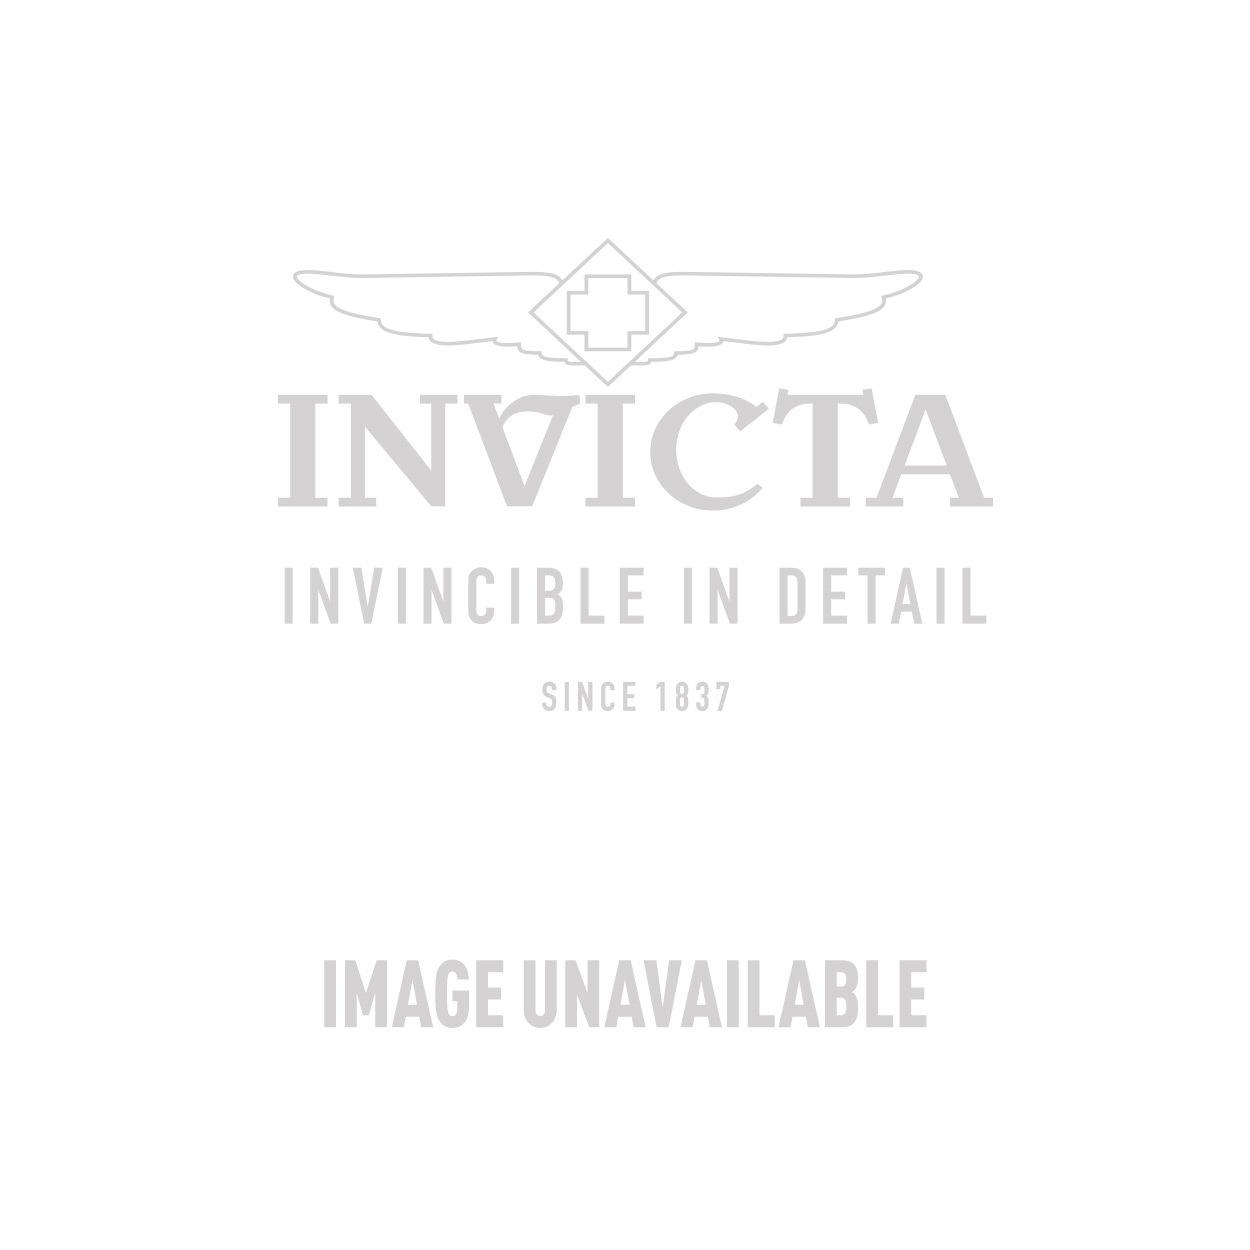 Invicta Sea Base Swiss Made Quartz Watch - Rose Gold, Titanium case with Black tone Polyurethane band - Model 14260